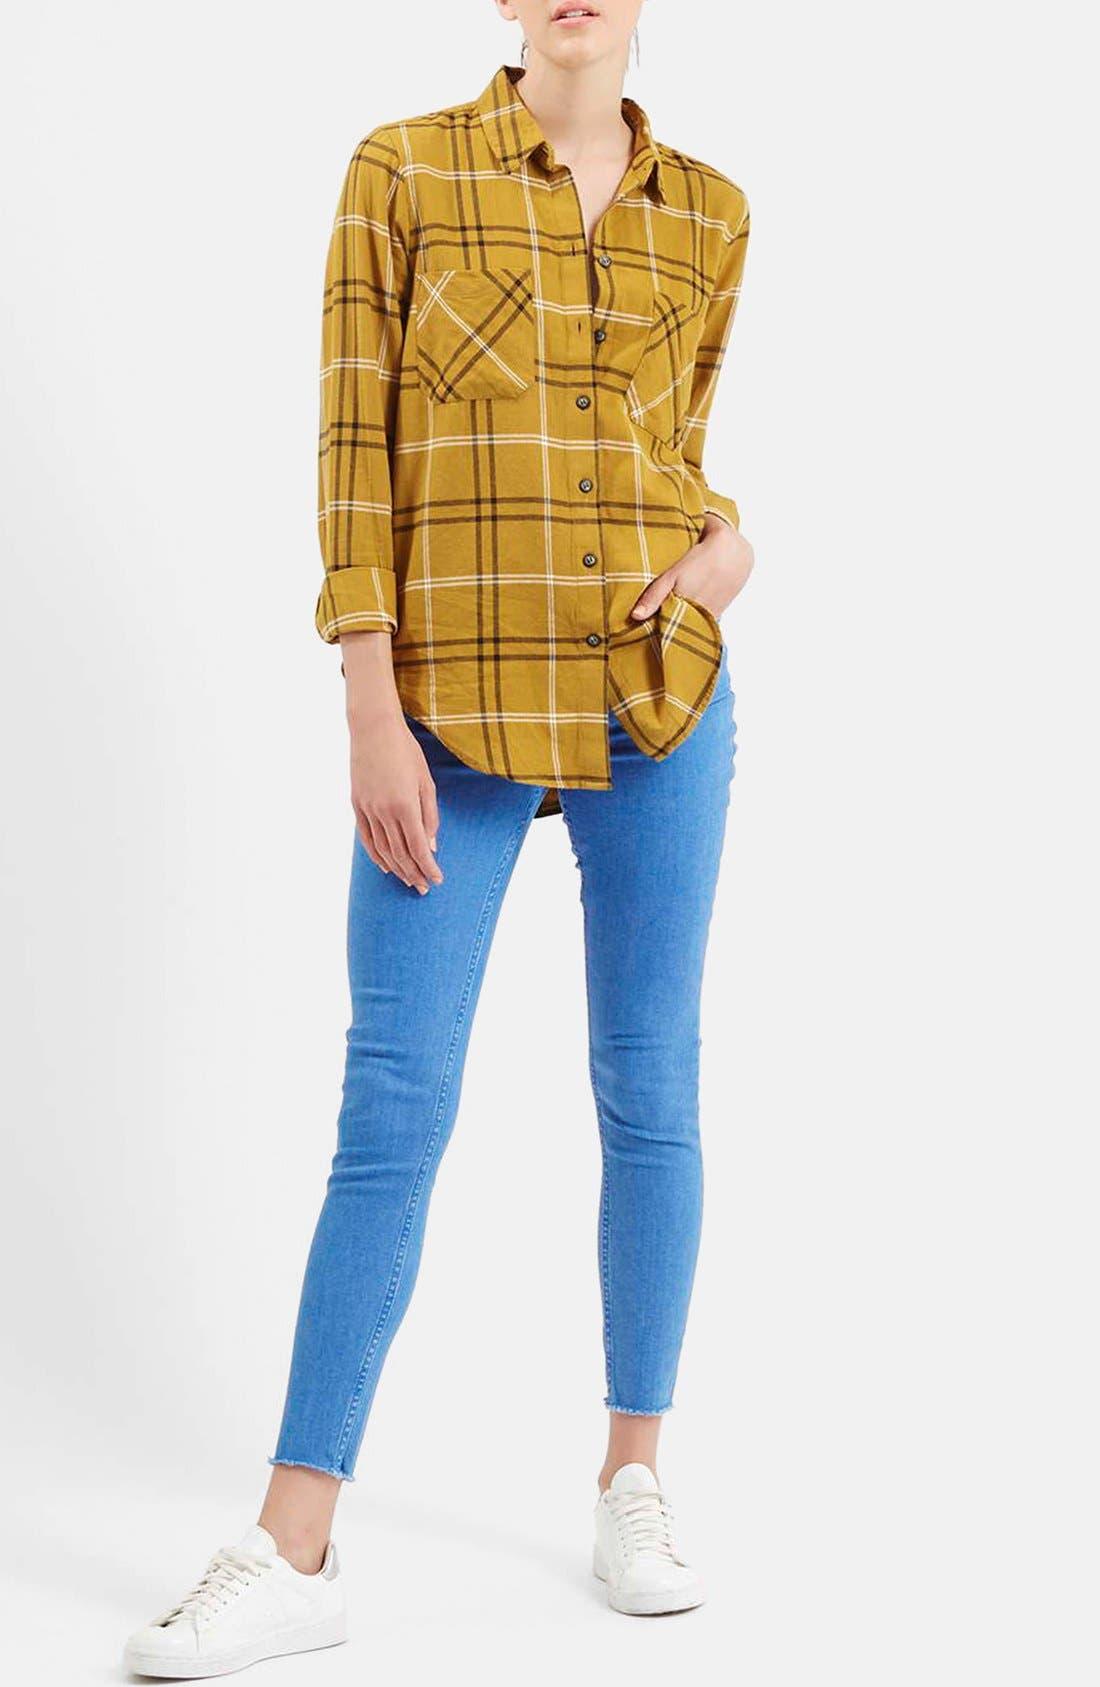 TOPSHOP, 'Billie' Check Button FrontBoyfriend Shirt, Alternate thumbnail 3, color, 701